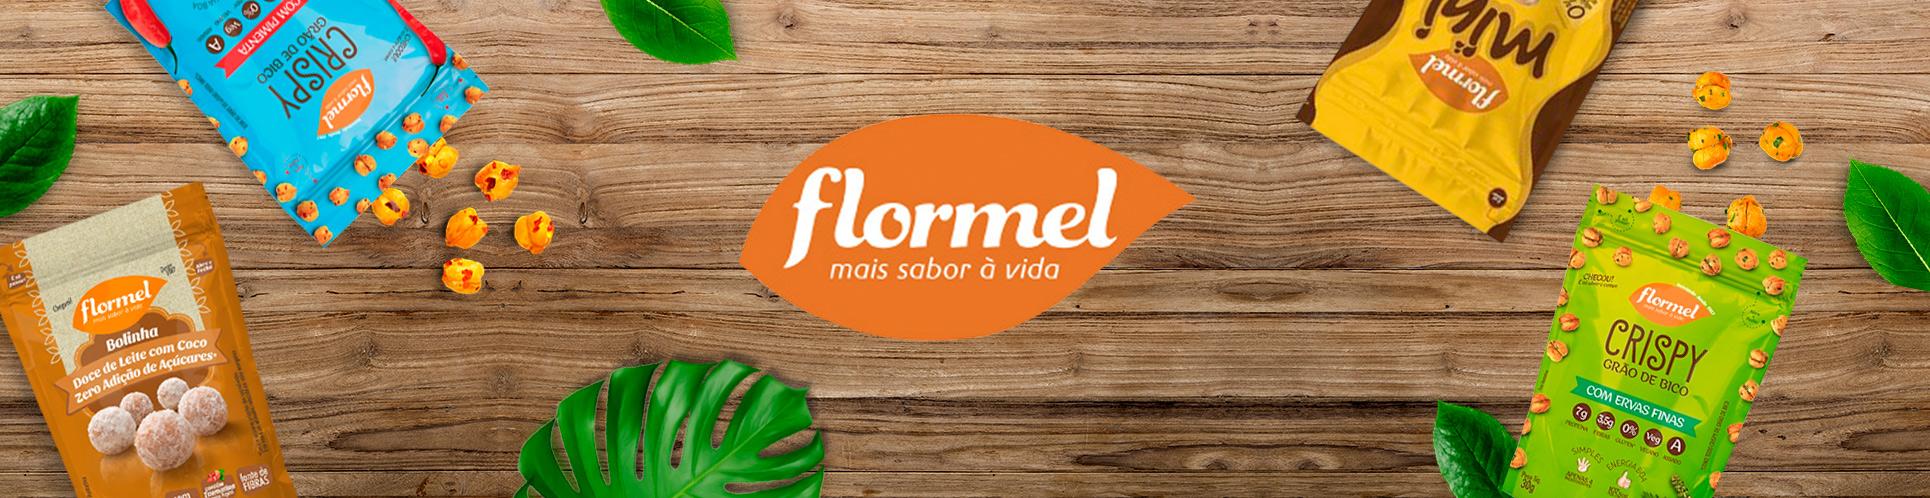 banner-vitrine_flormel